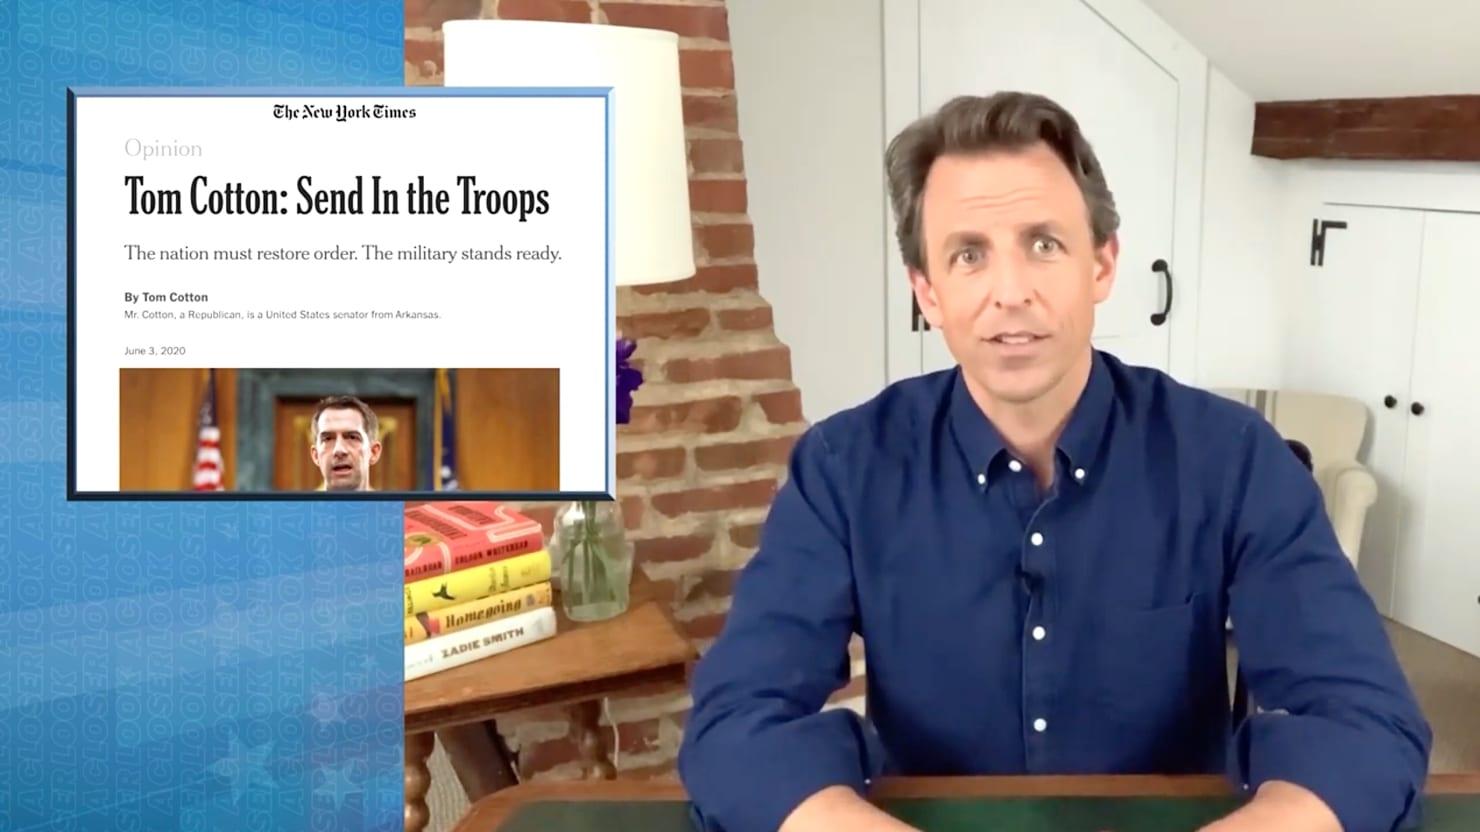 Seth Meyers Demolishes New York Times for Running 'Fascist' Tom Cotton Op-Ed